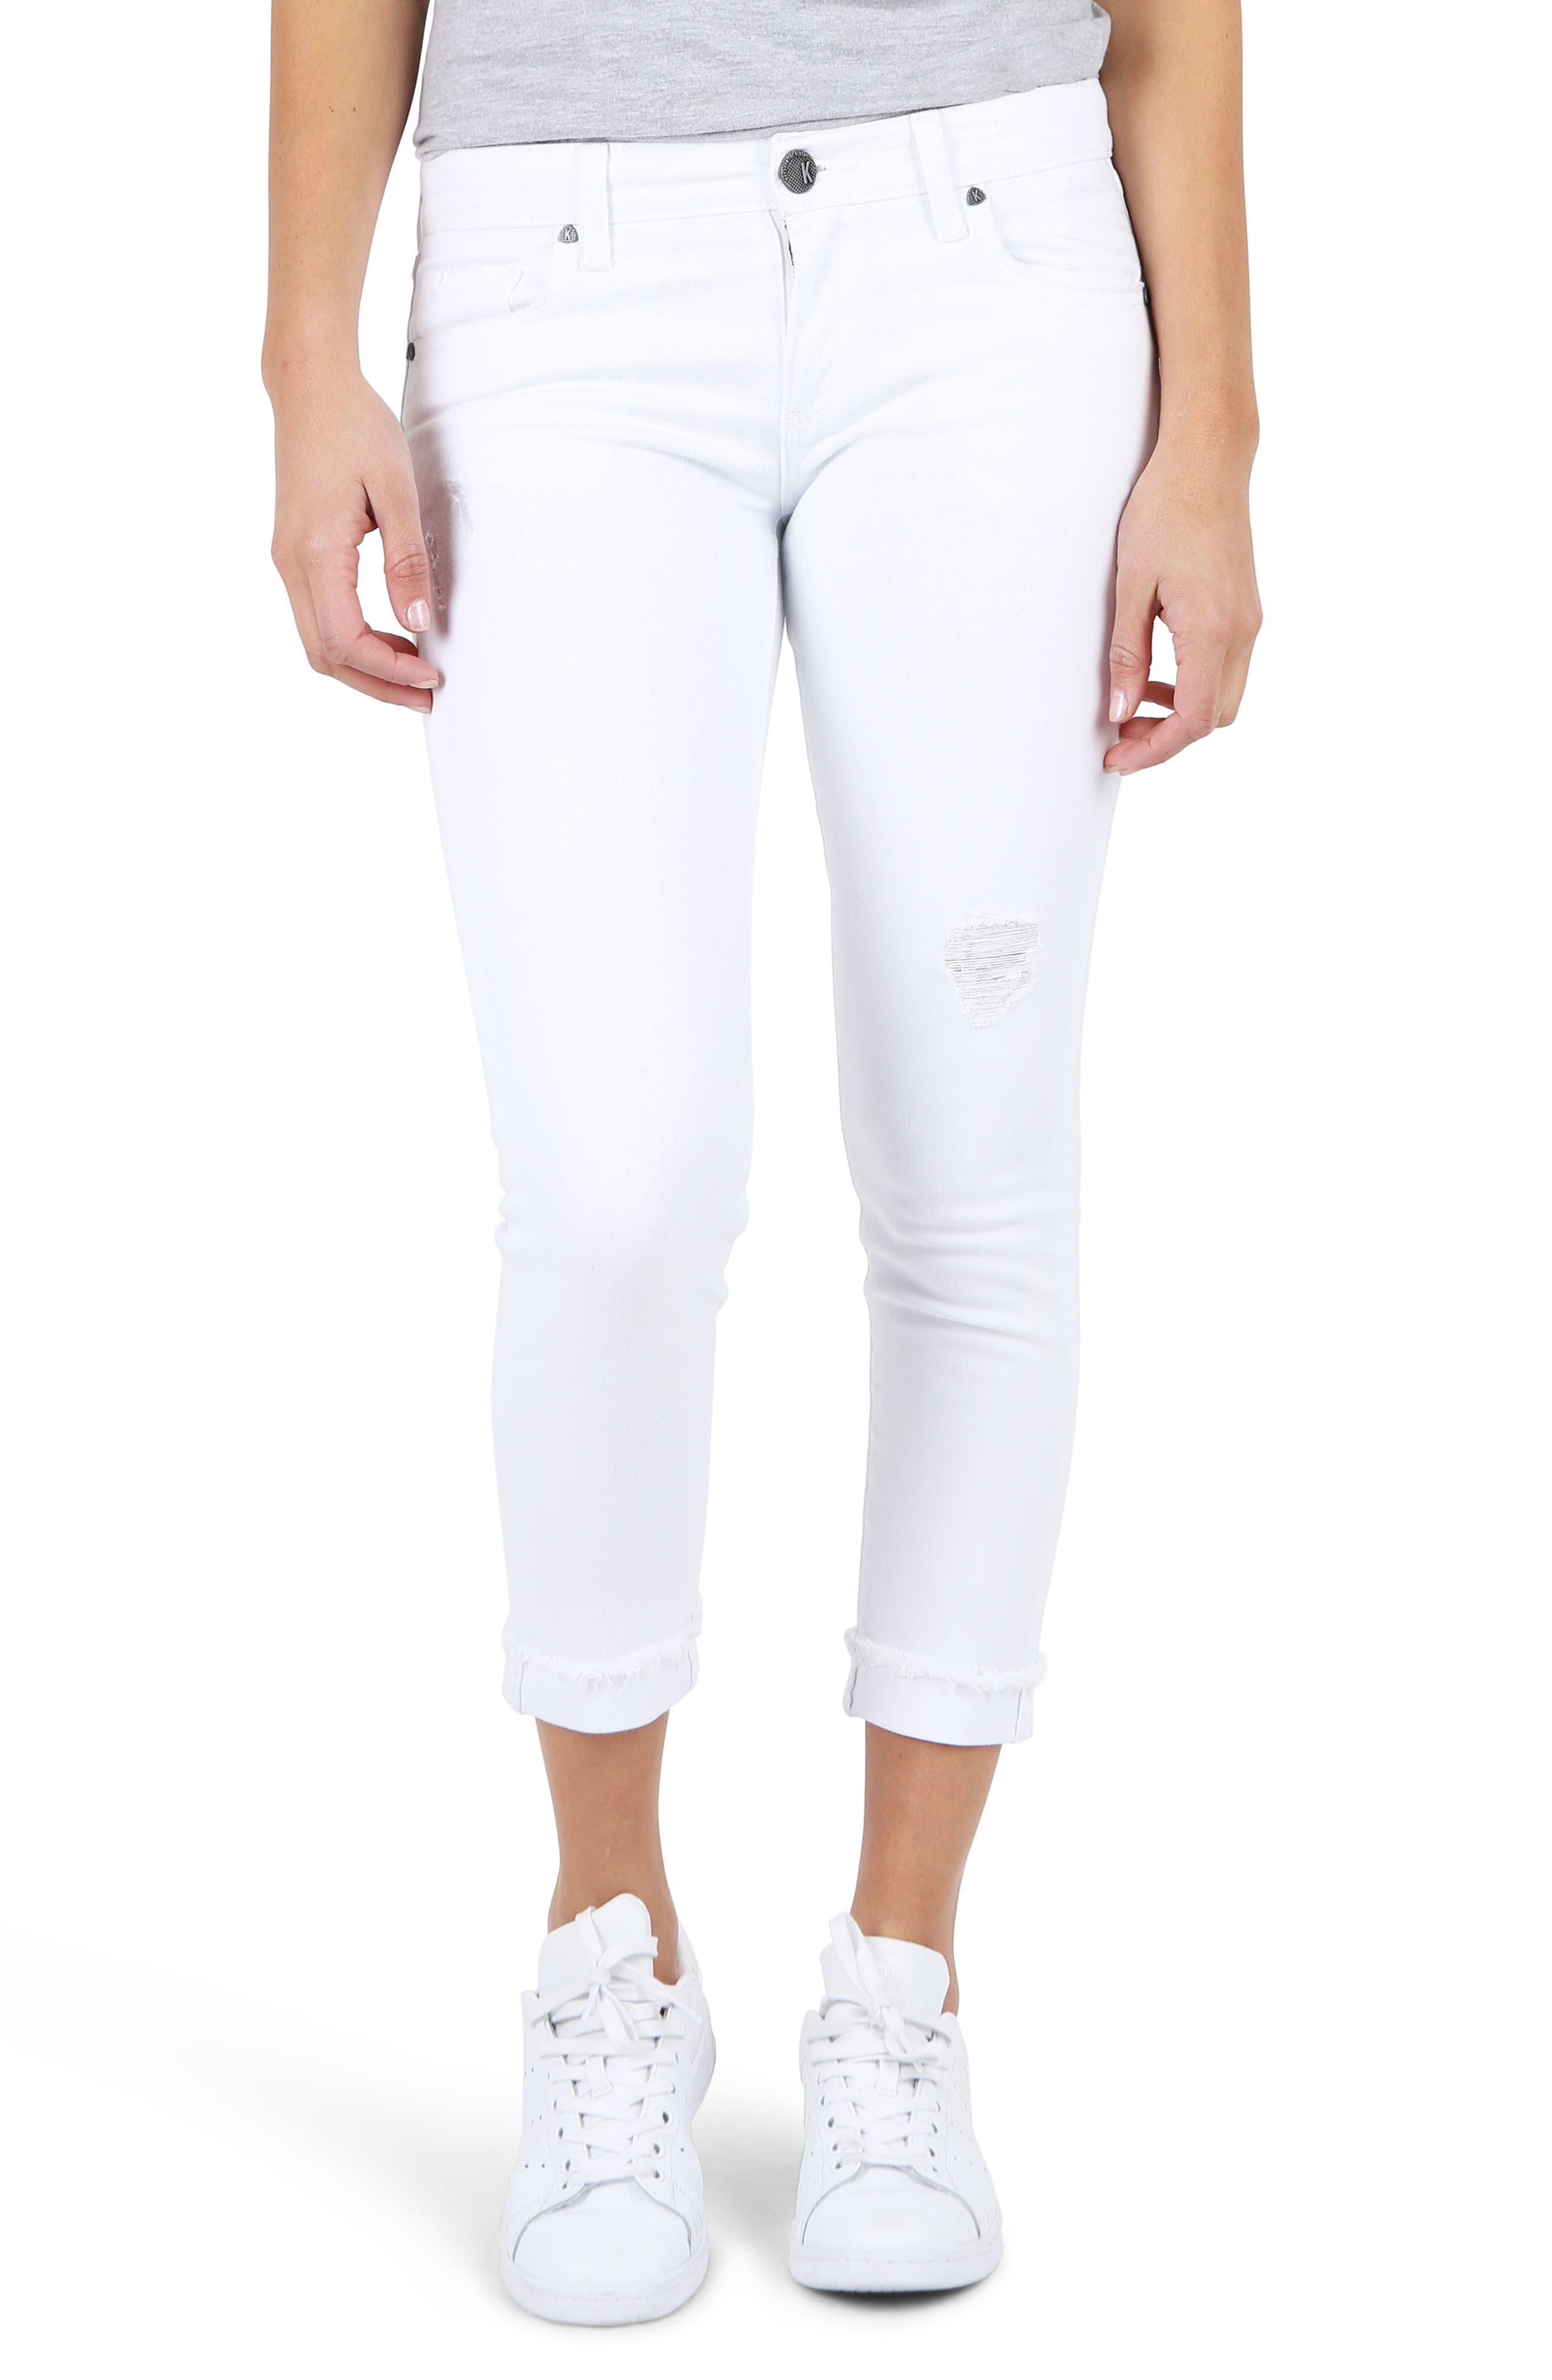 Kut Kollection Amy Crop White Jeans, White